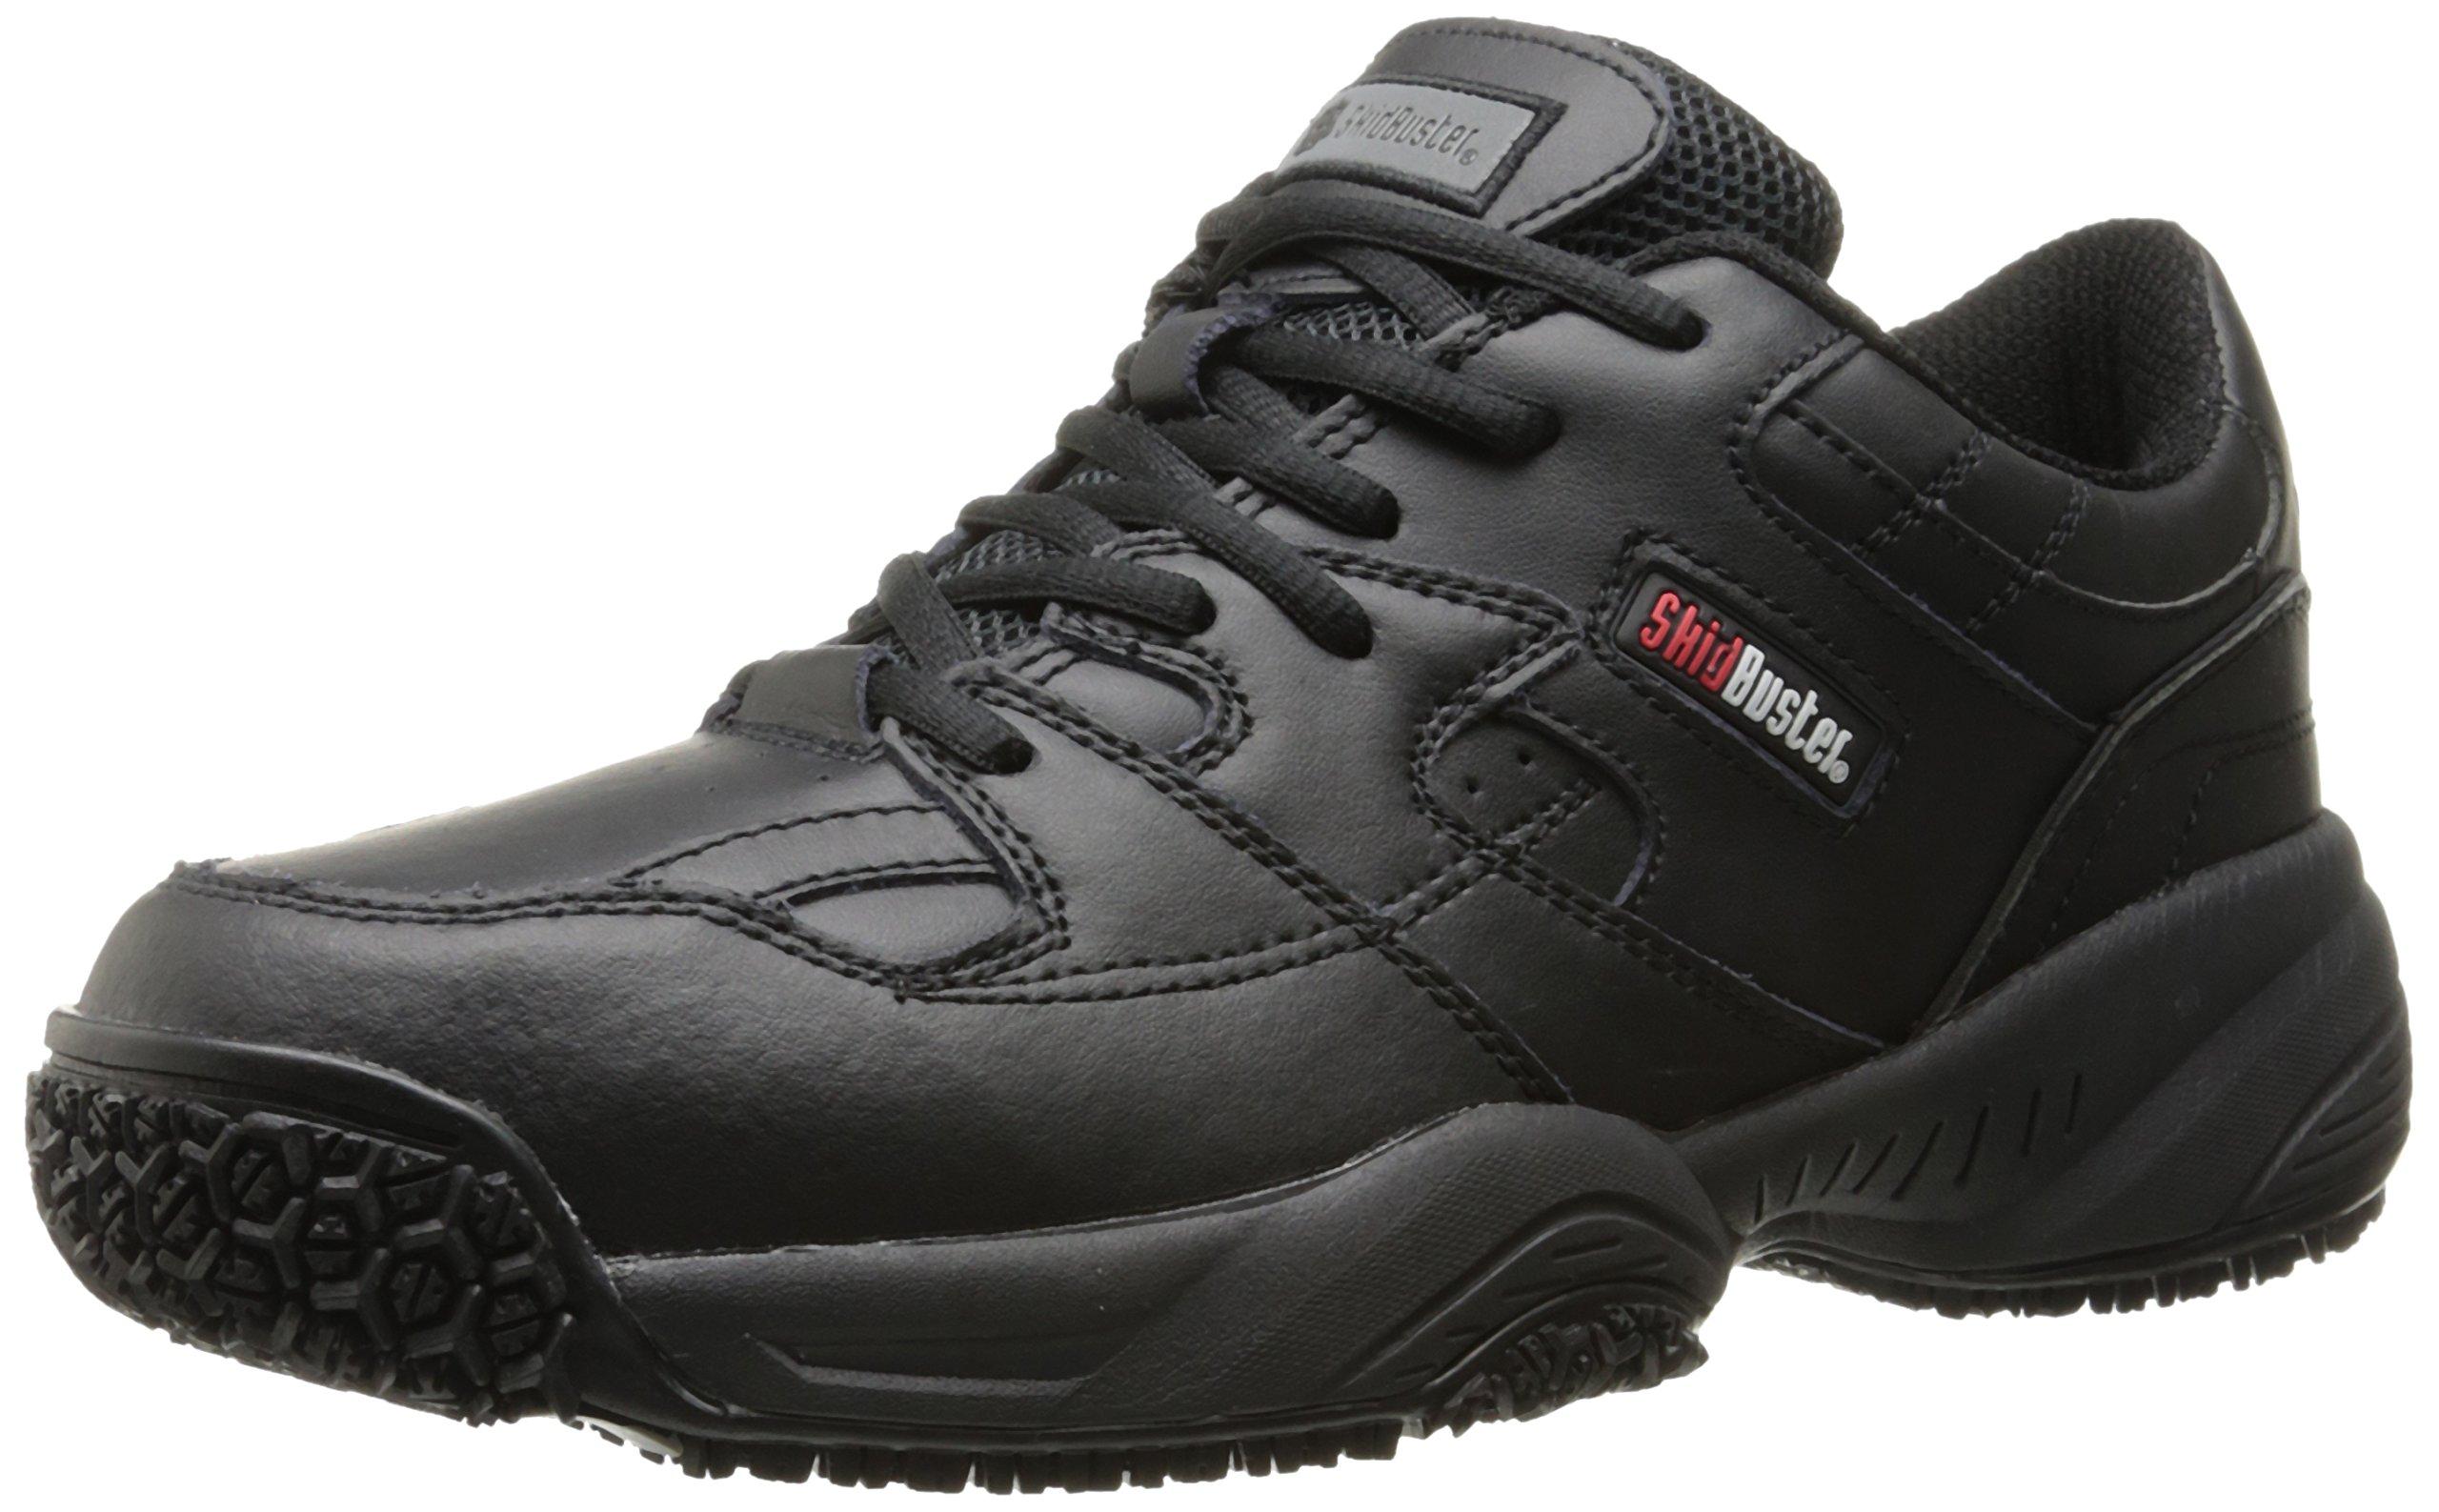 Skidbuster 5050 Men's Leather Comfort Slip Resistant Athletic Shoe,Black,12 W US by SkidBuster Footwear